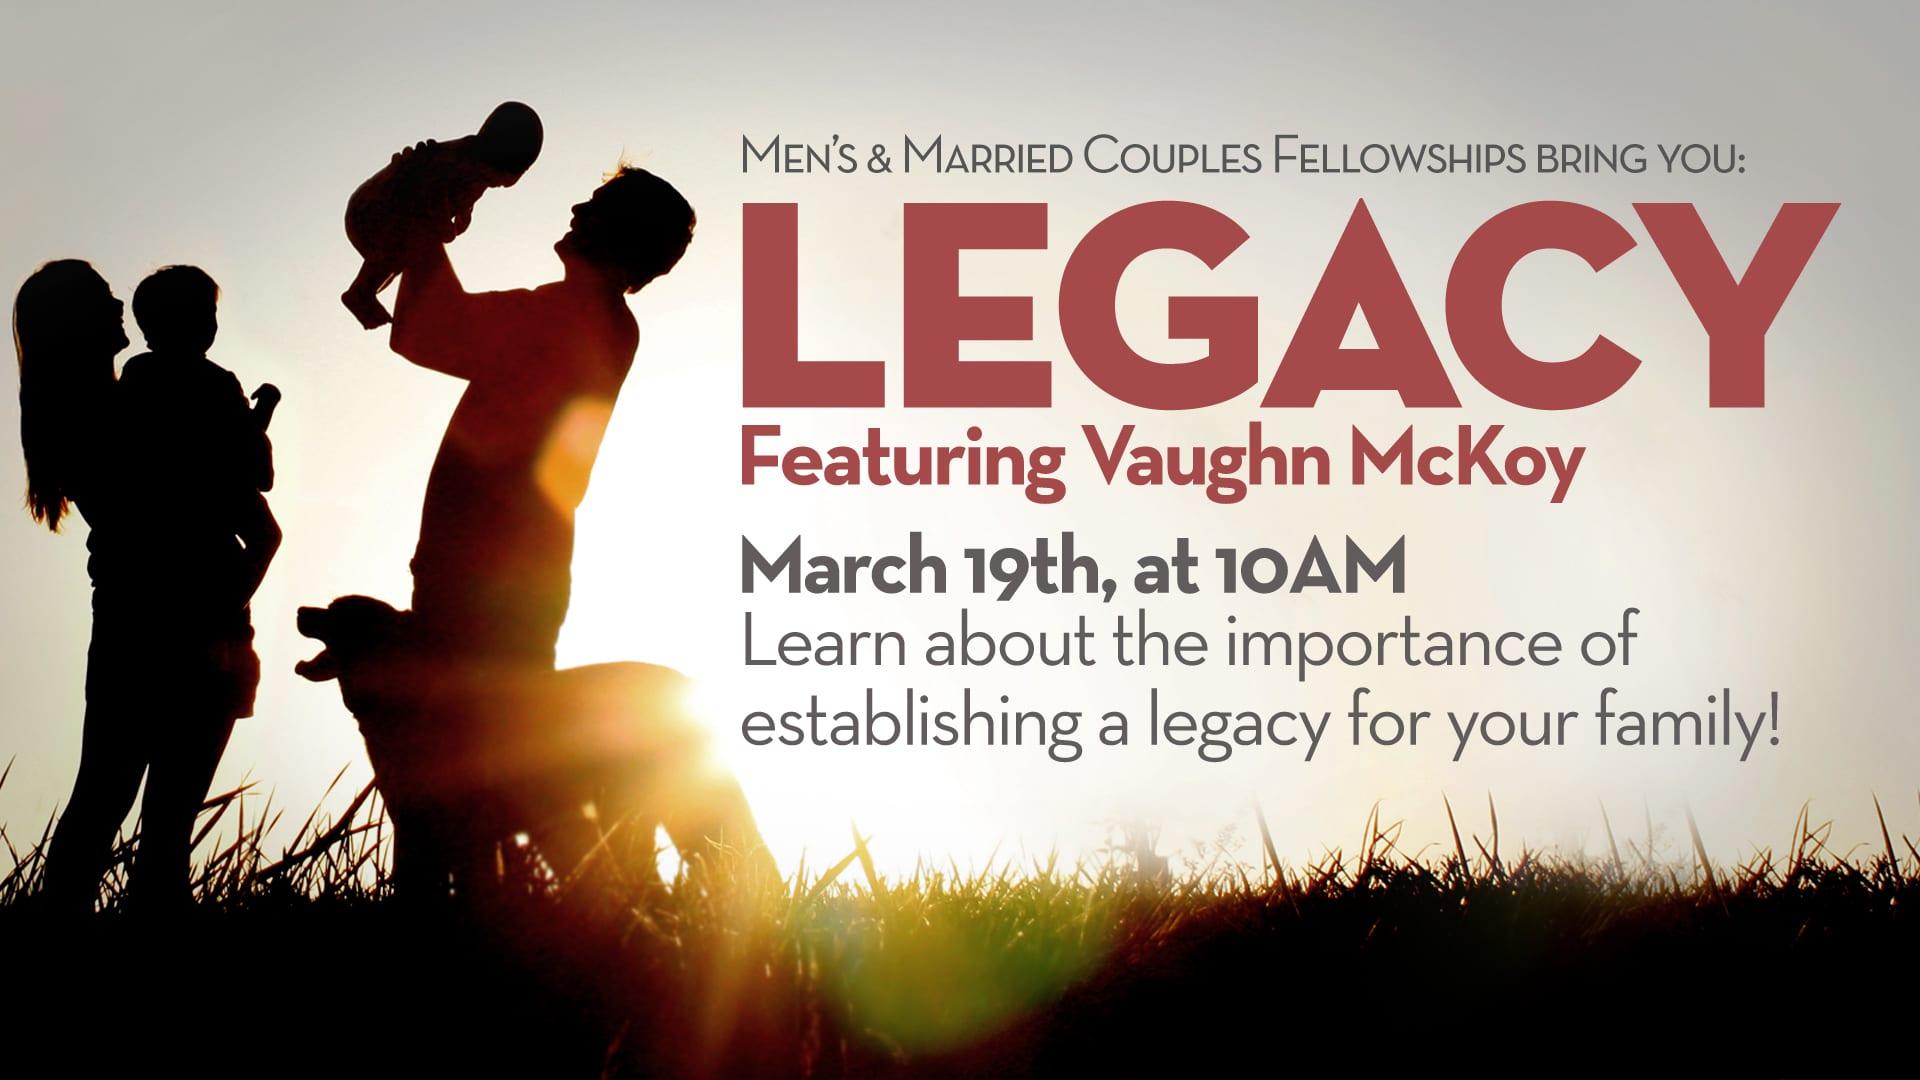 Legacy featuring Vaughn McKoy